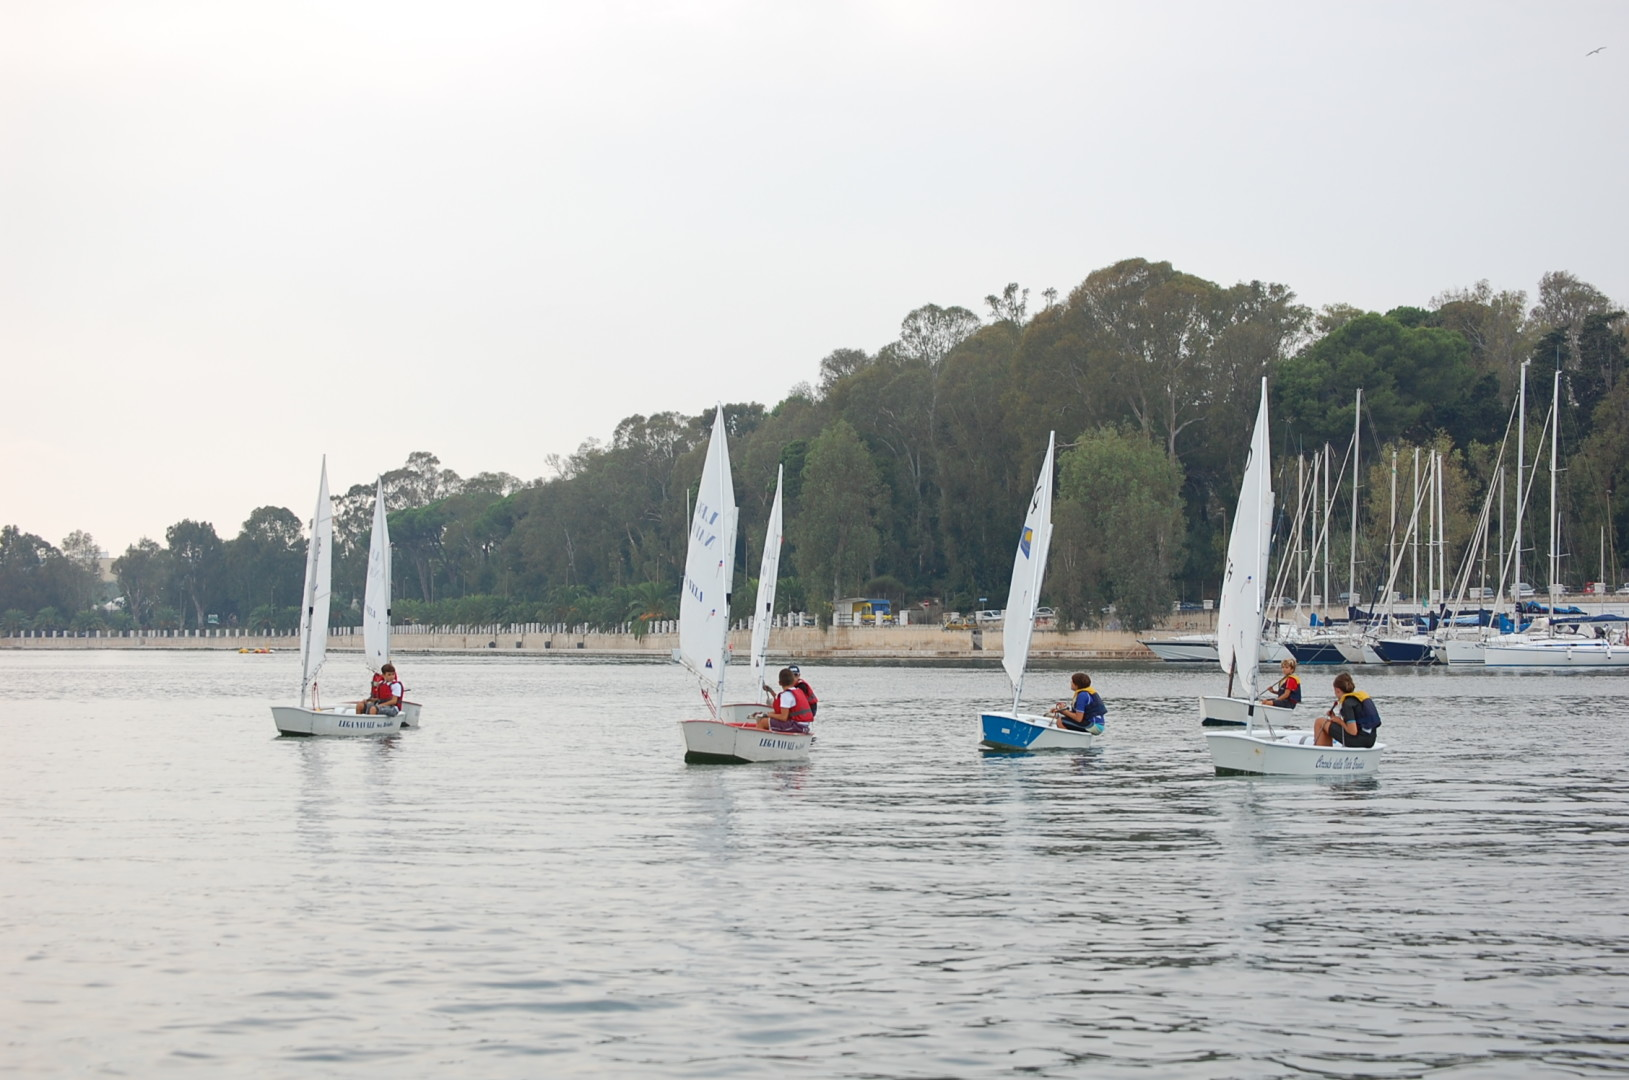 Scuola-di-vela-lega-navale-LNI-Brindisi (18)